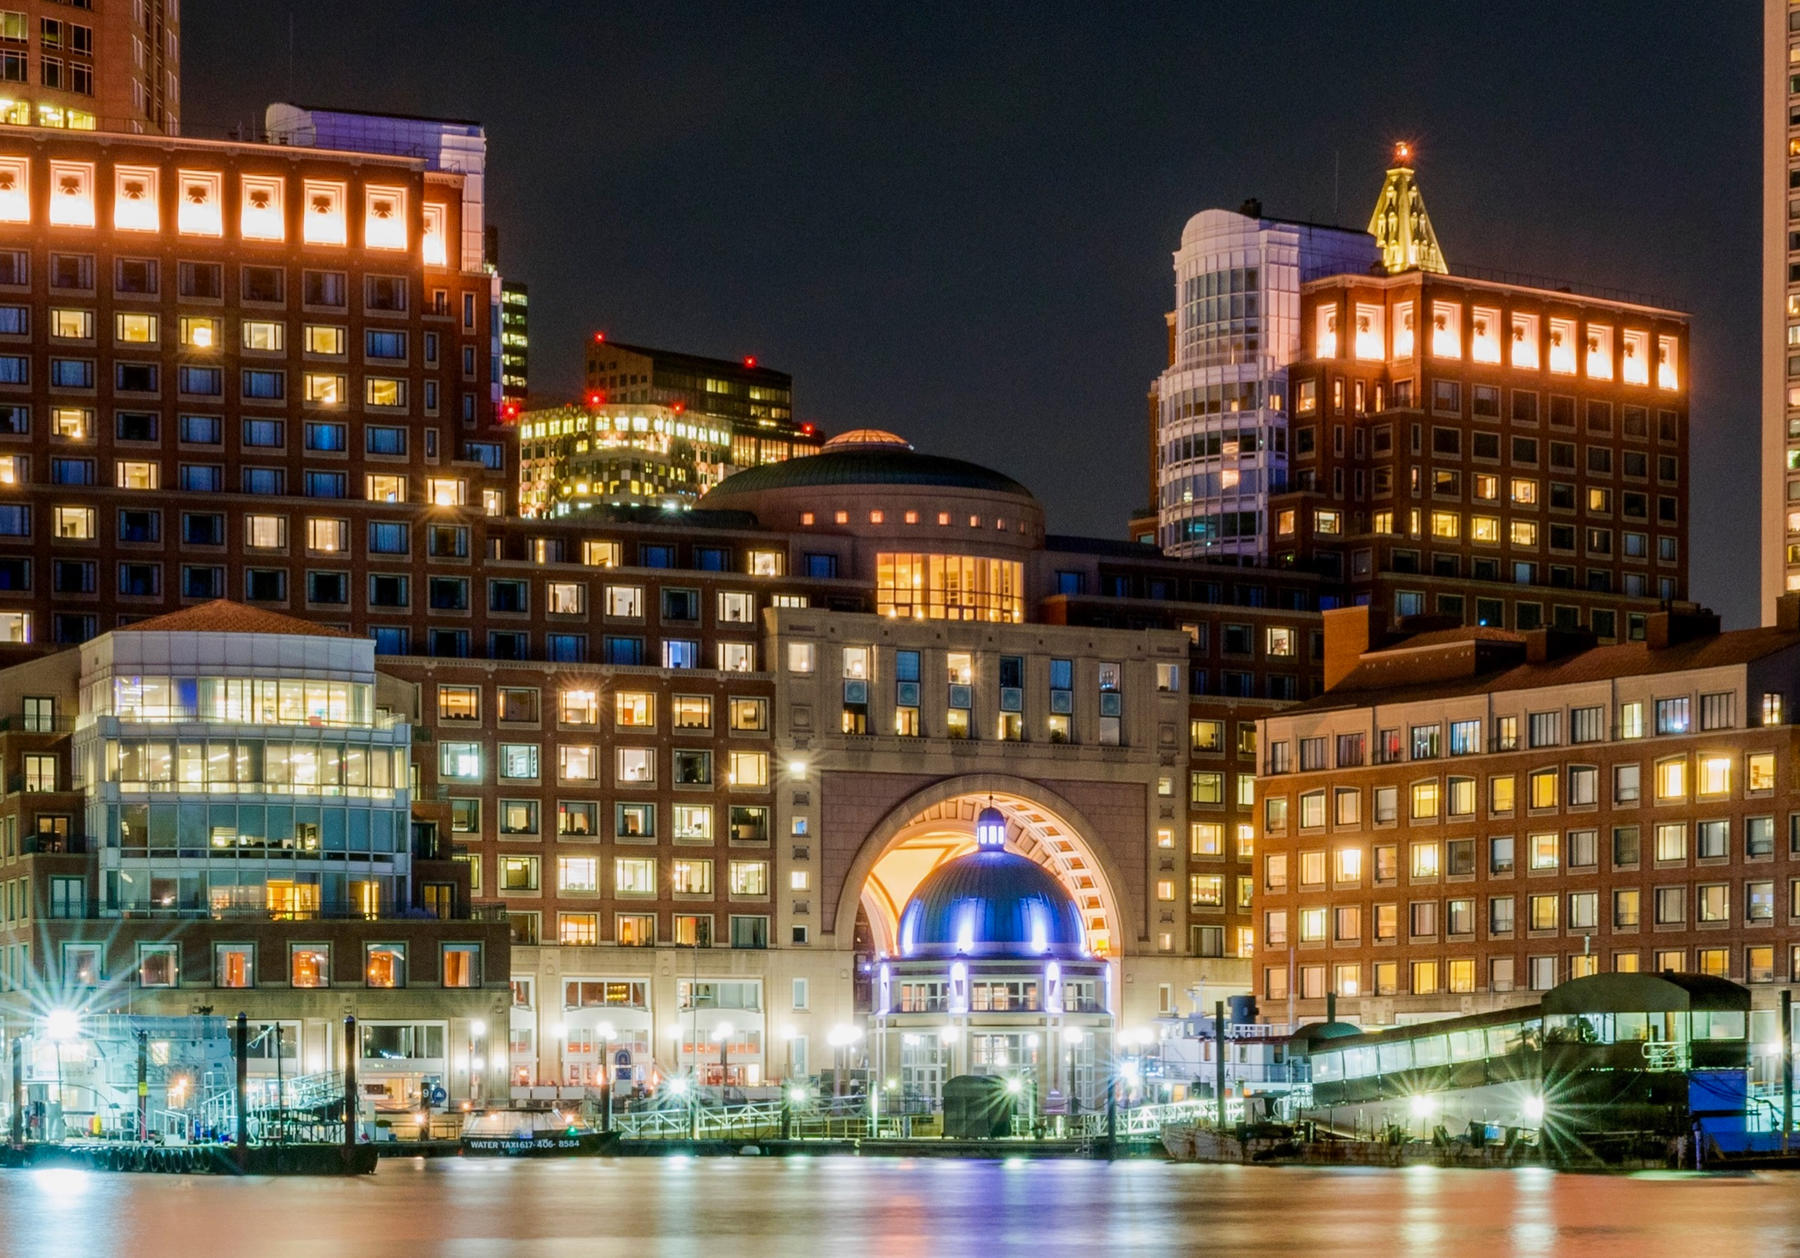 Boston Harbor Hotel exterior at night